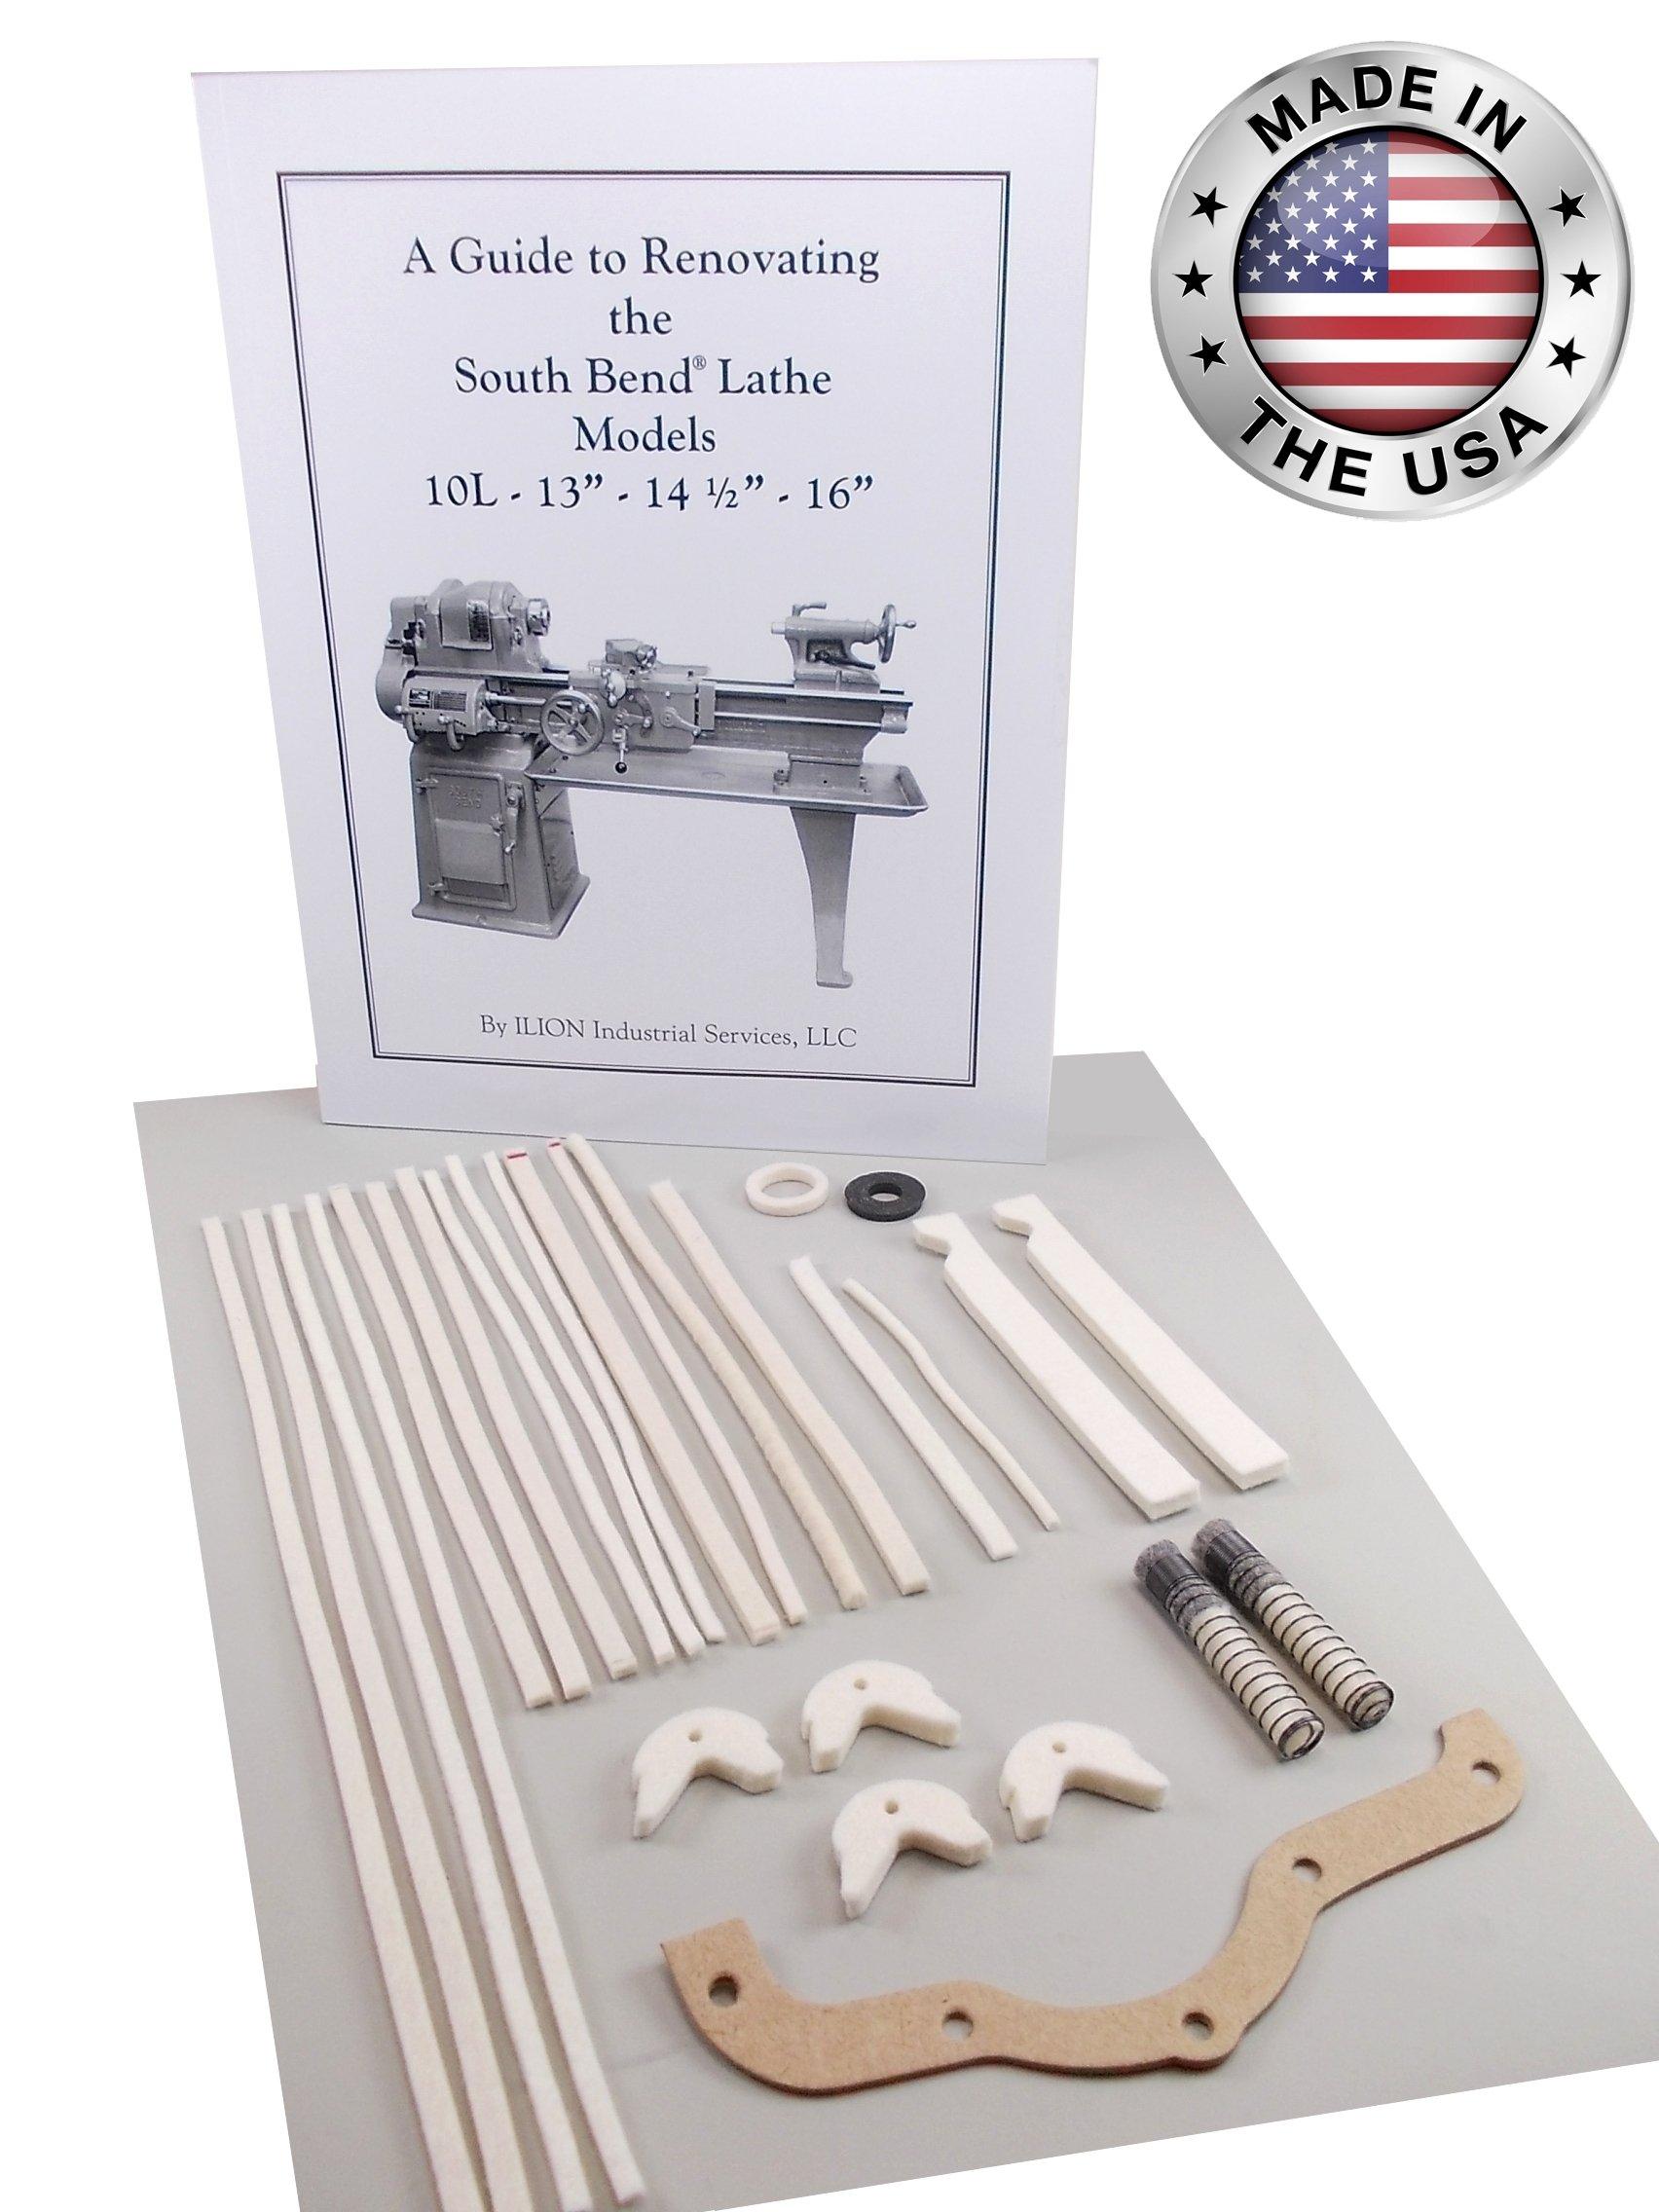 South Bend Lathe Rebuild Kit - Model 10L or 10R ''Heavy 10'' by ILION Industrial Services LLC